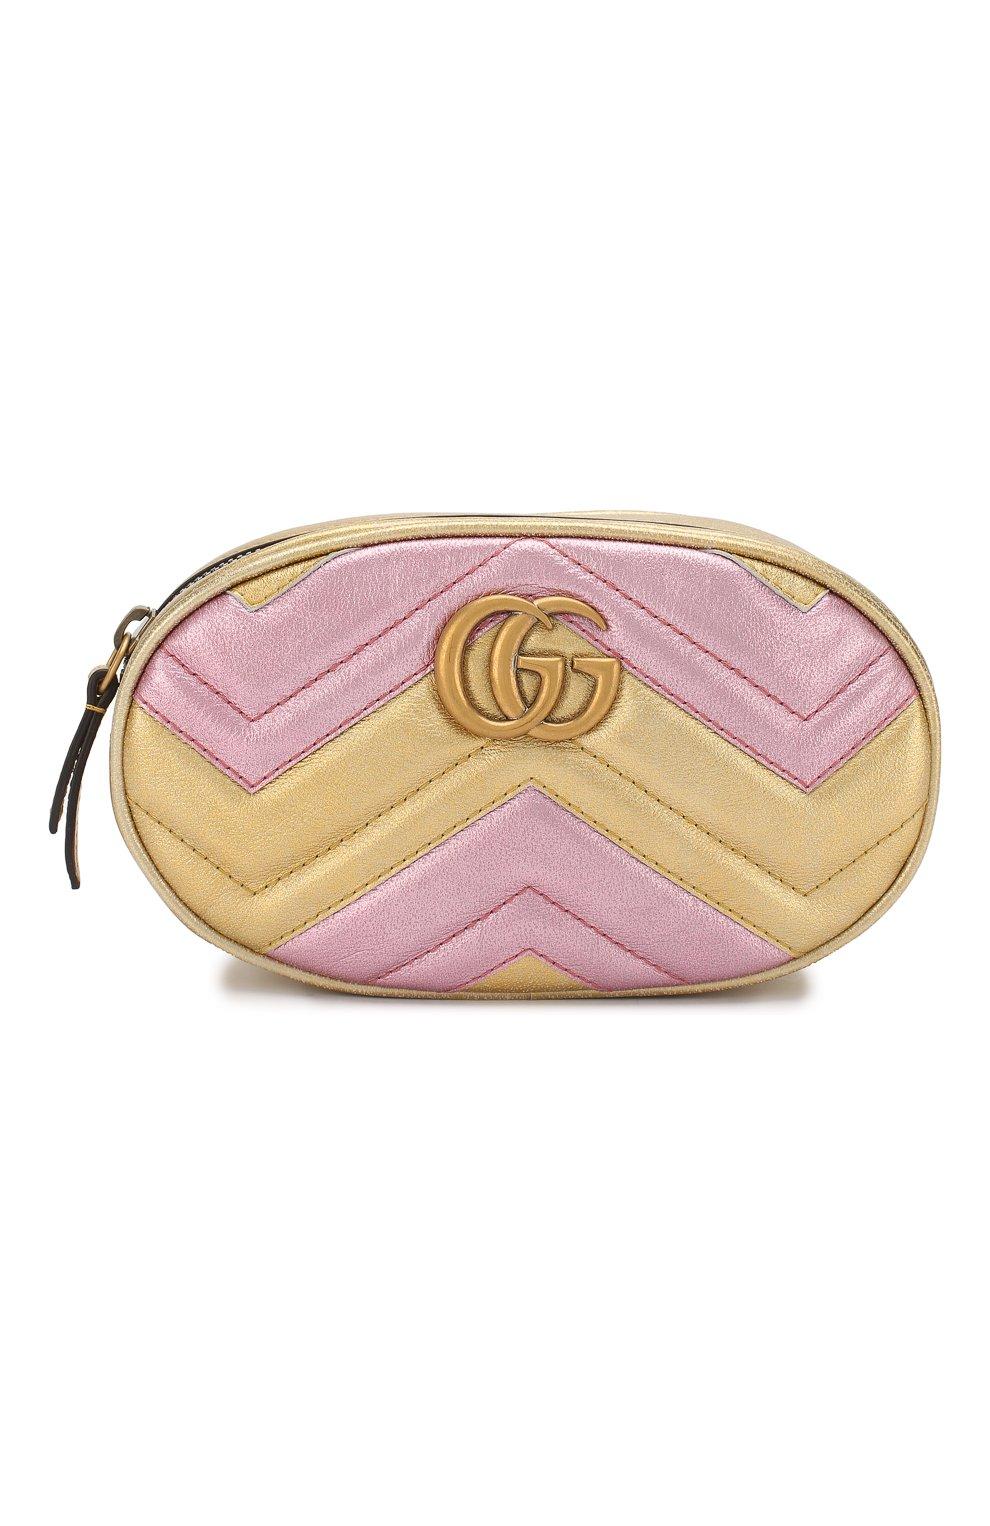 Поясная сумка GG Marmont   Фото №1